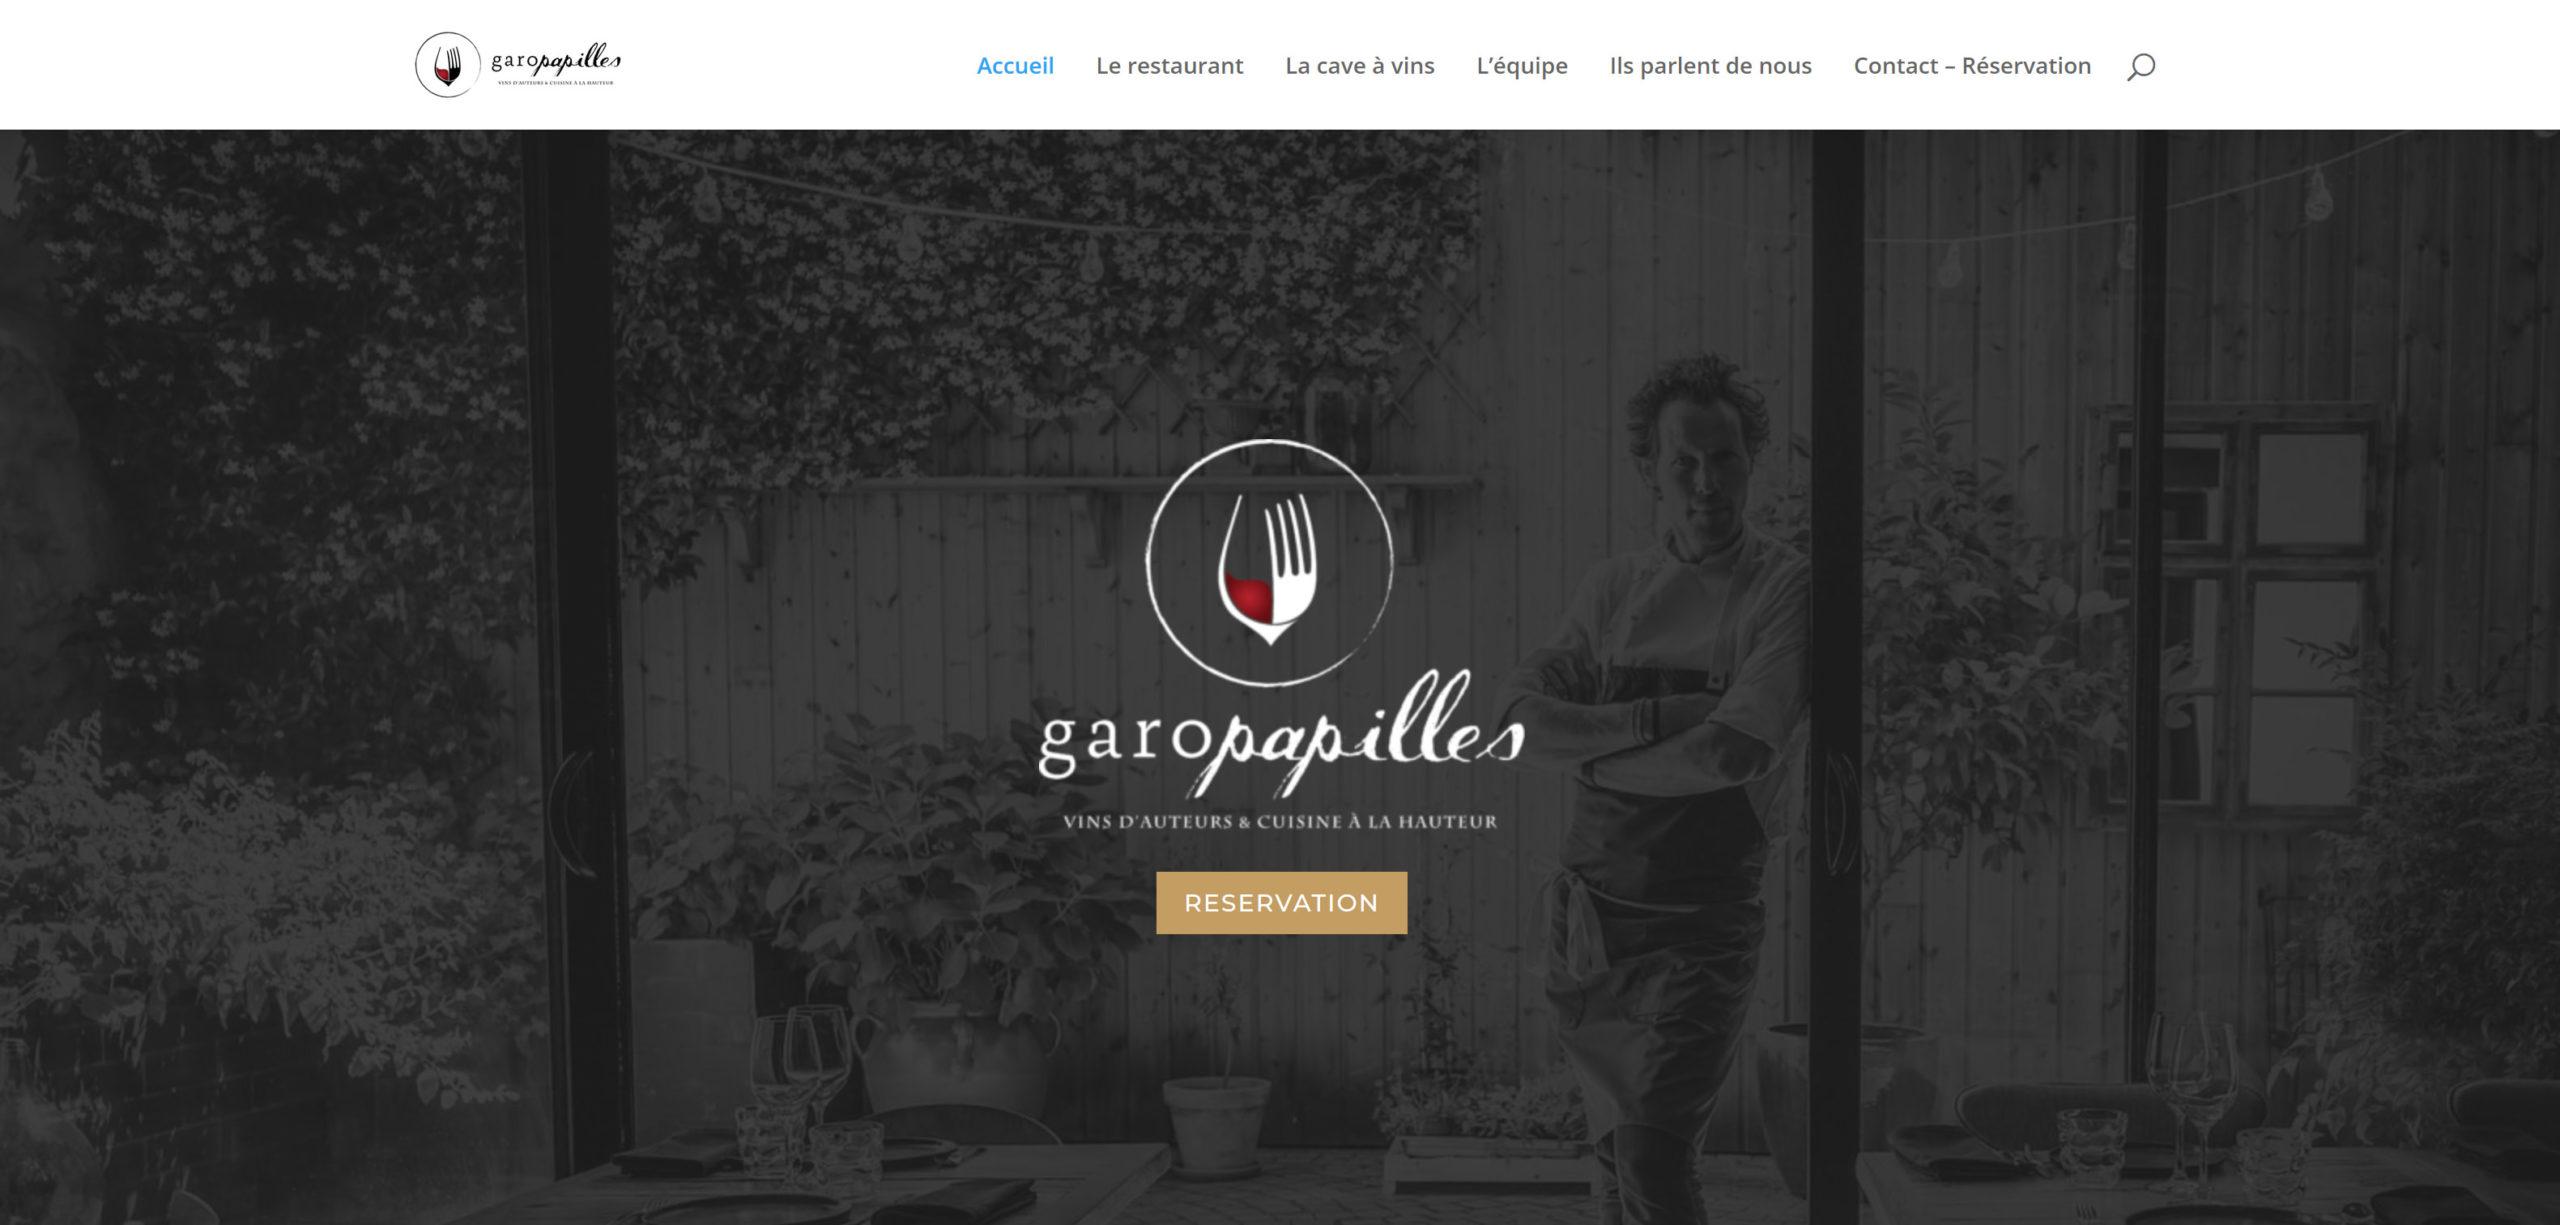 Garopapilles